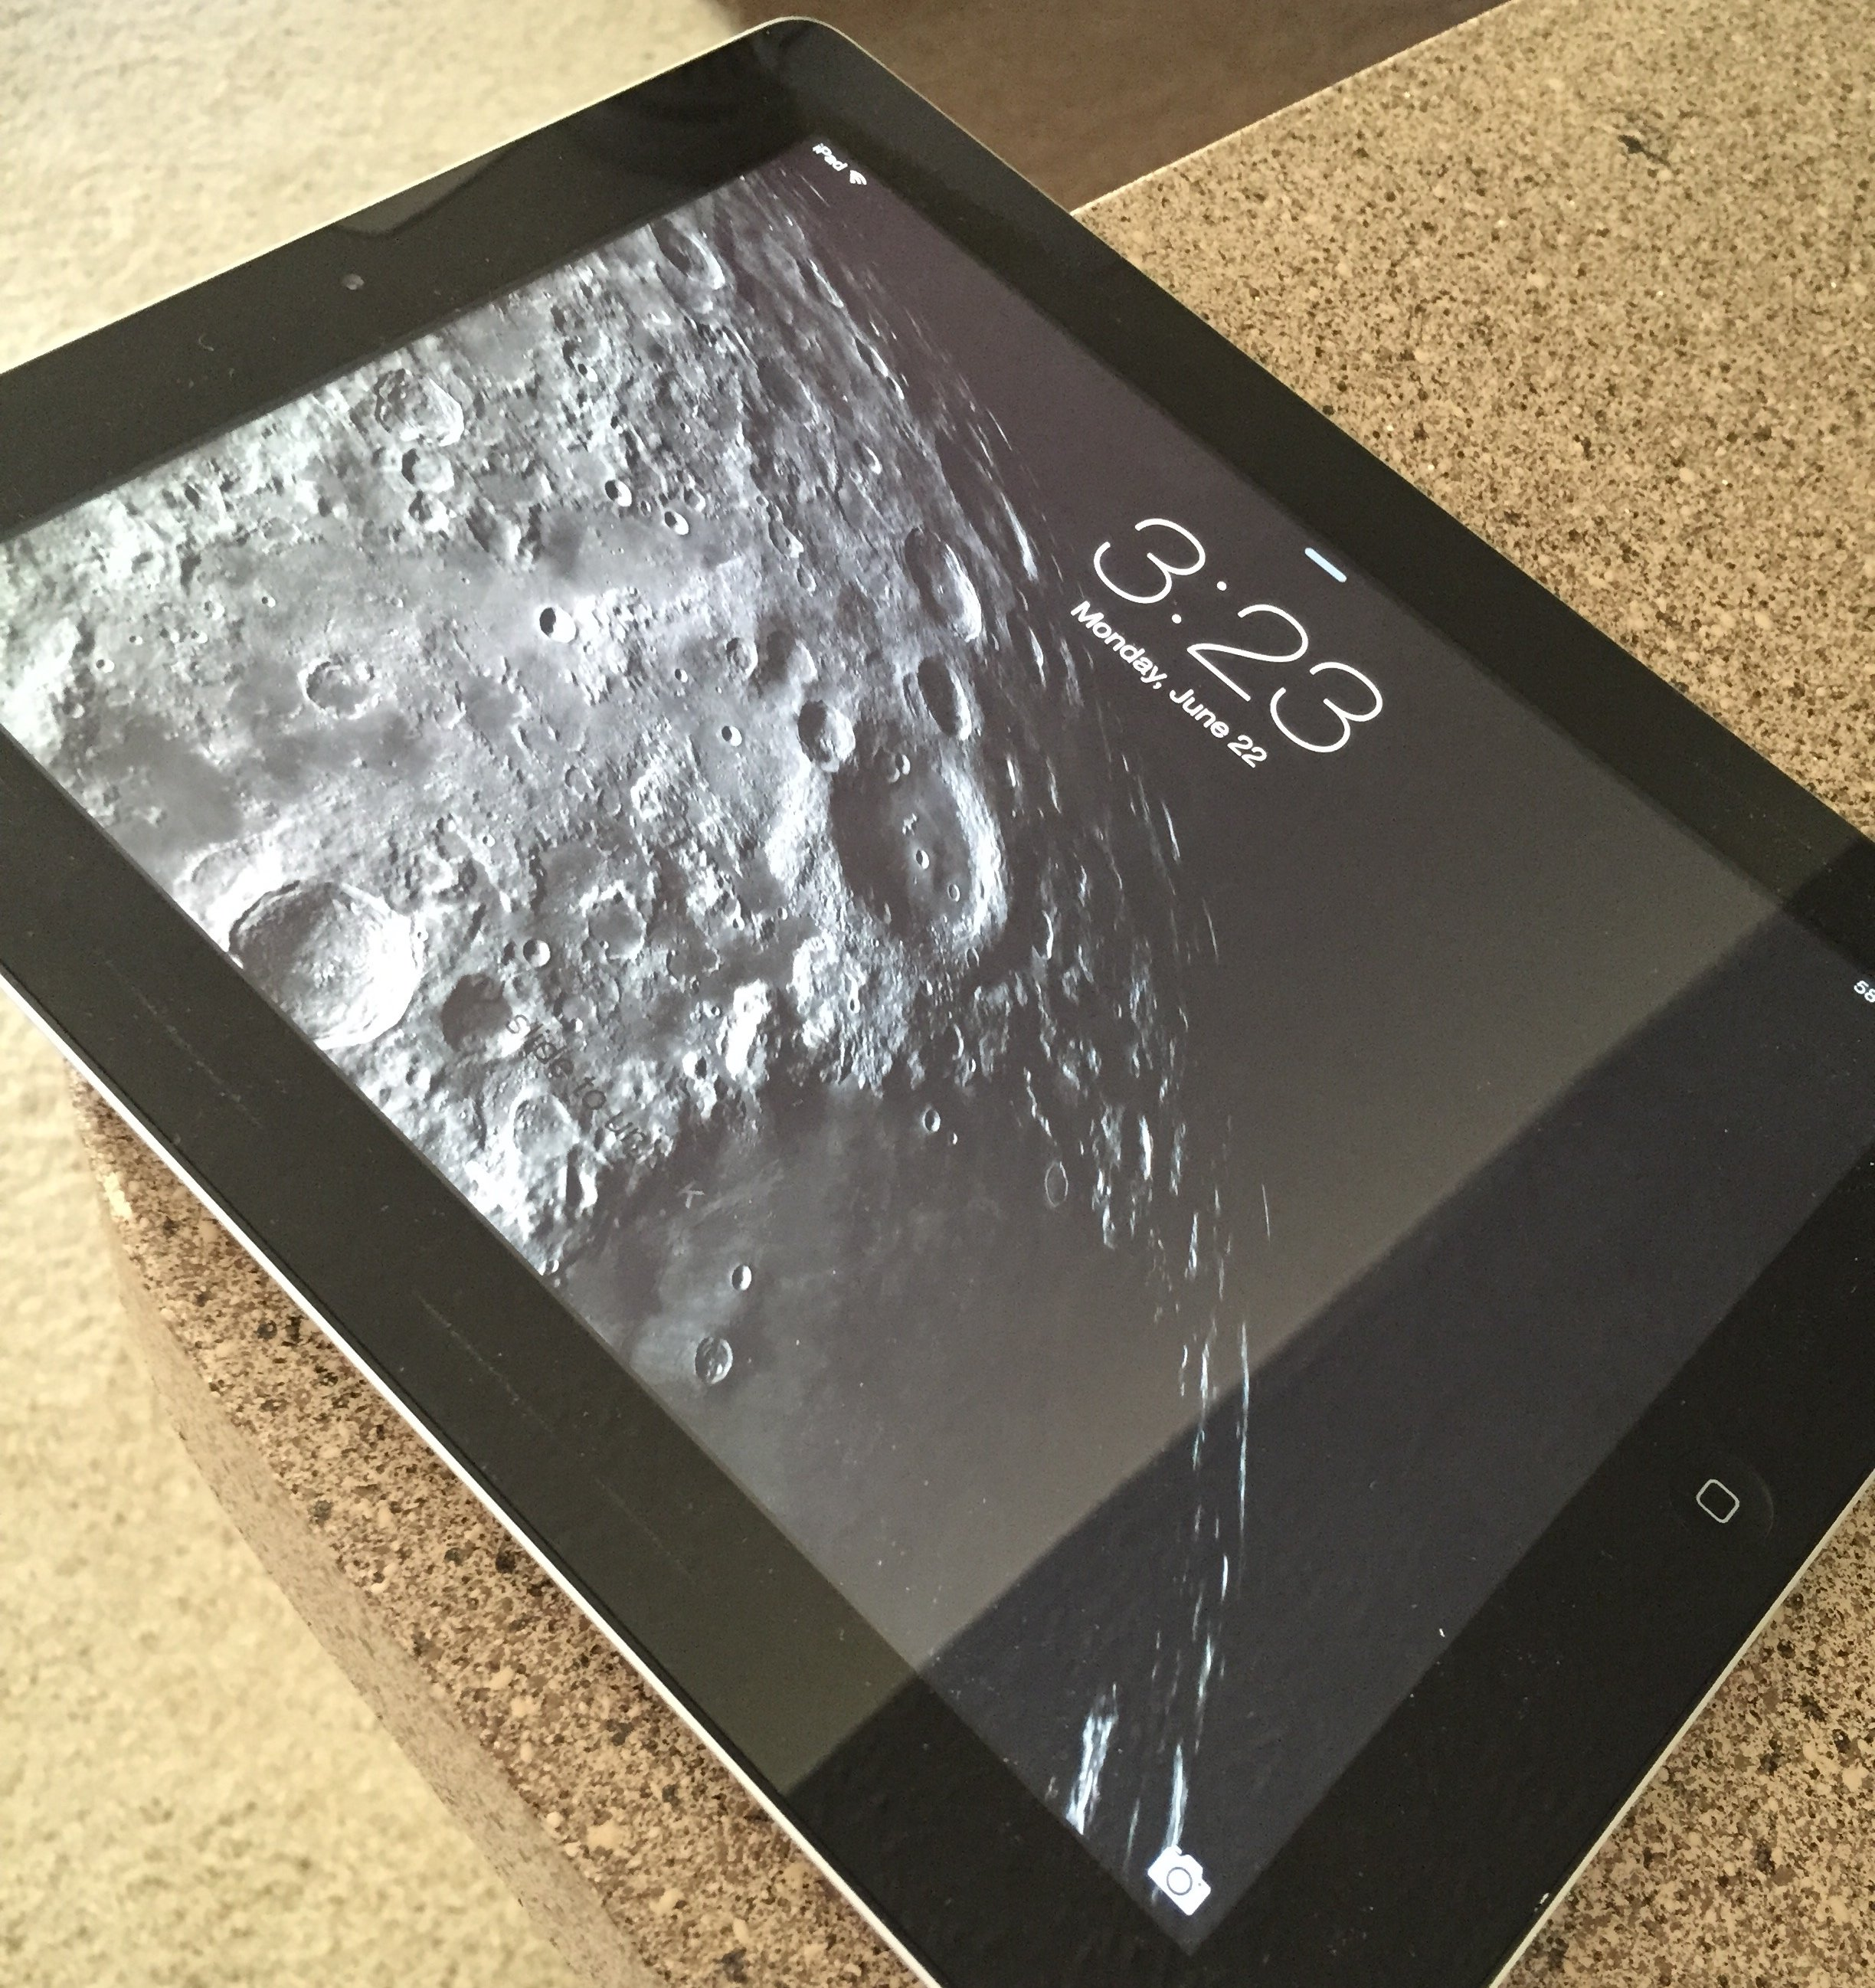 3 Reasons I Love My Tablet